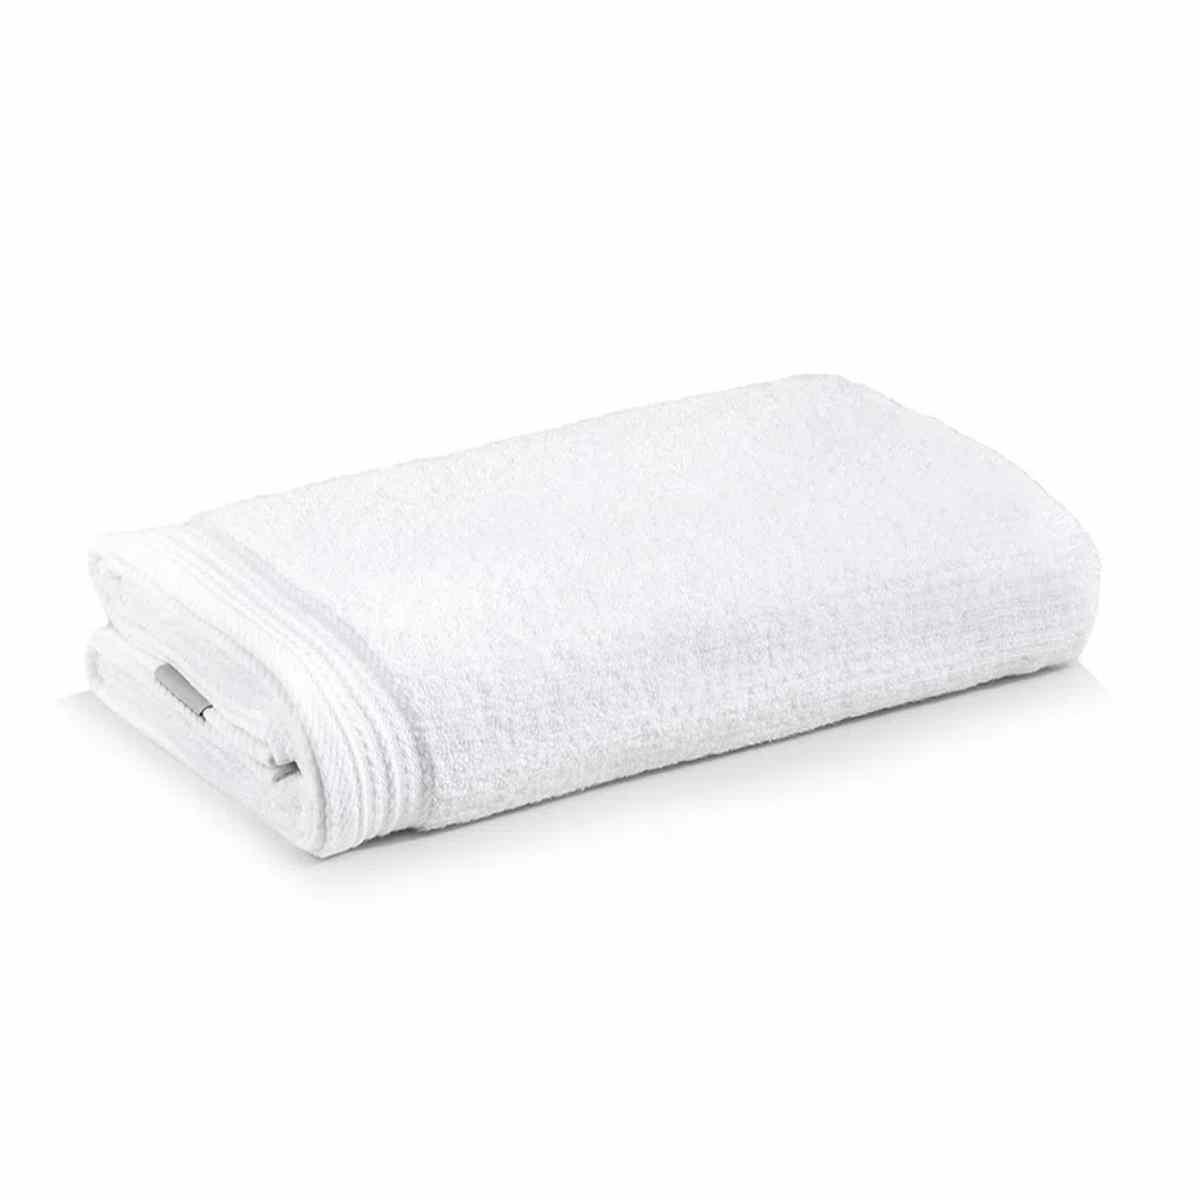 Toalha rosto imperial 48x80 Branco